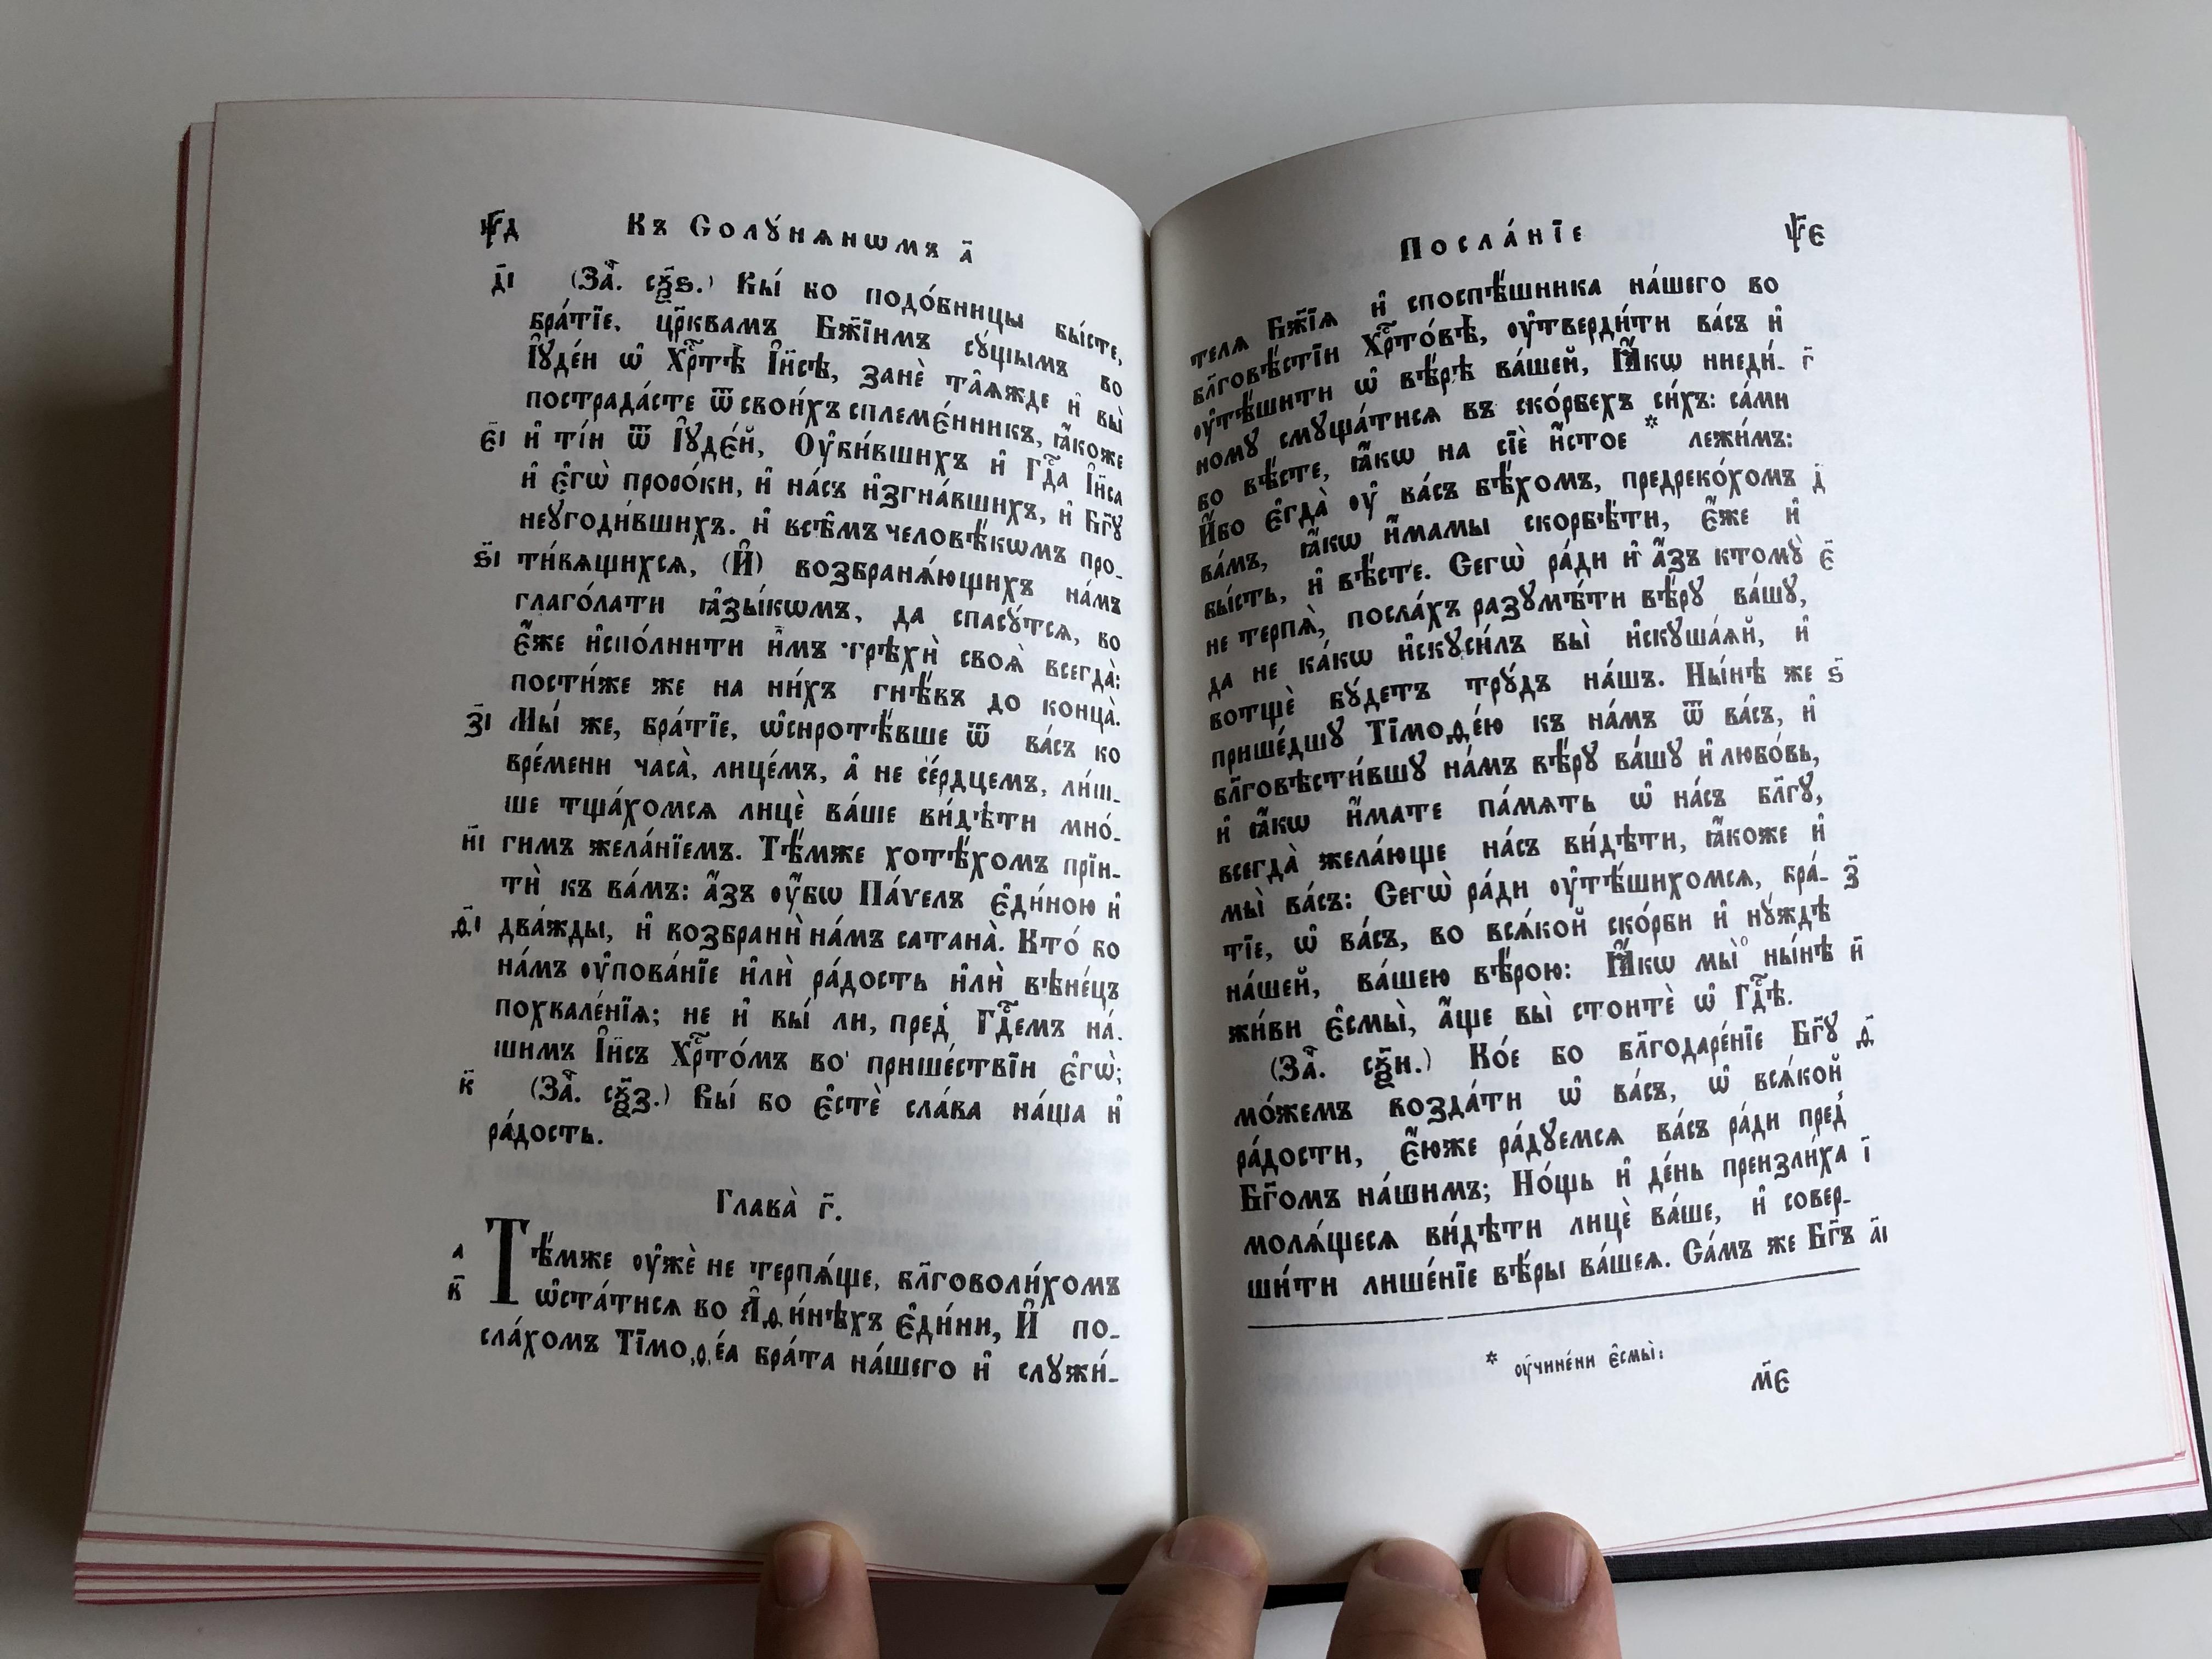 new-testament-in-slavonic-large-wide-margin-11hardcover-red-page-edges-united-bible-societies-1959-edition-church-slavonic-crkveno-slovenski-novi-zavet.jpg